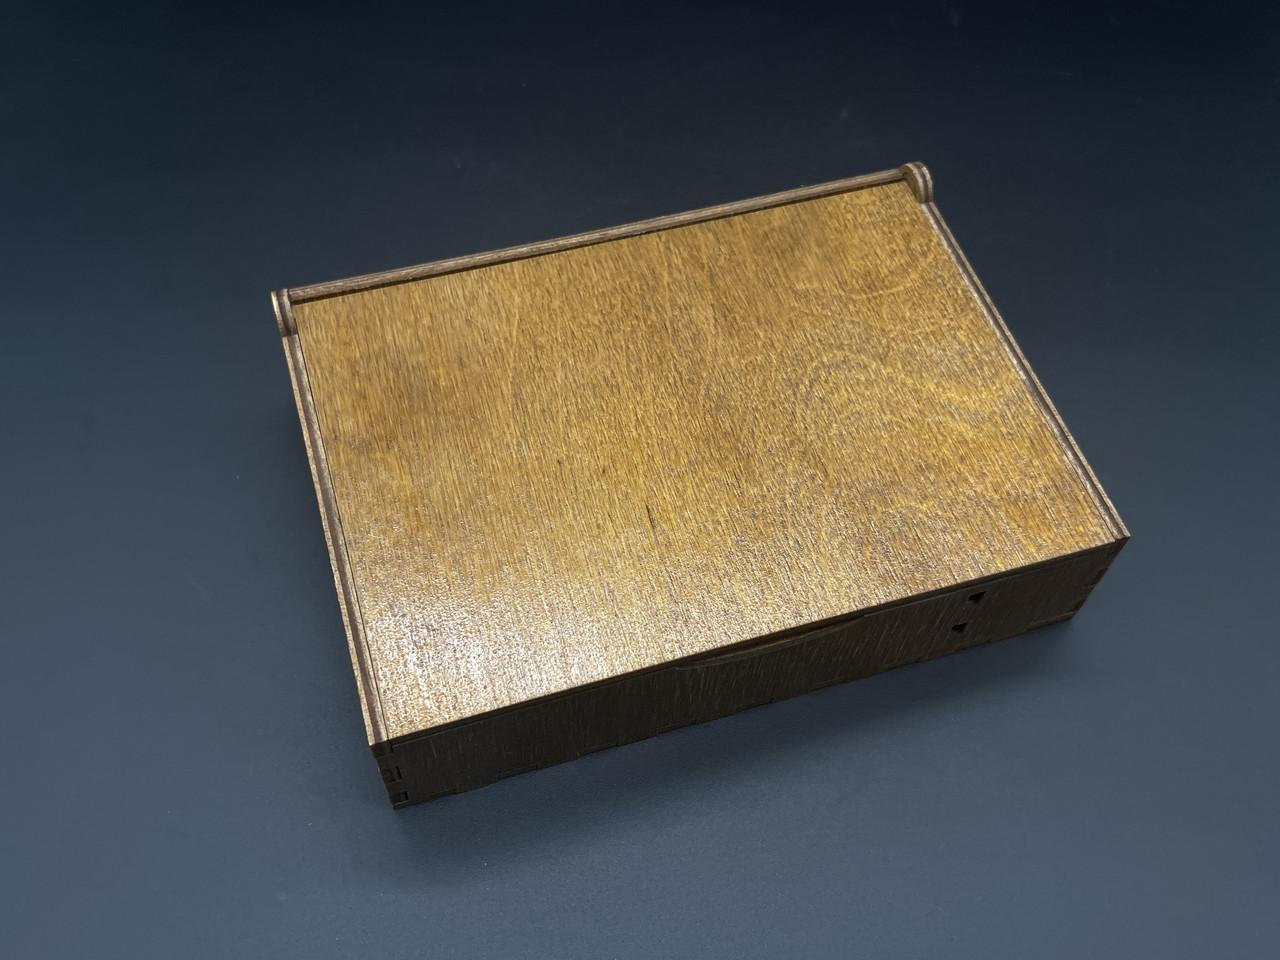 Скринька органайзер. 17х12х4см